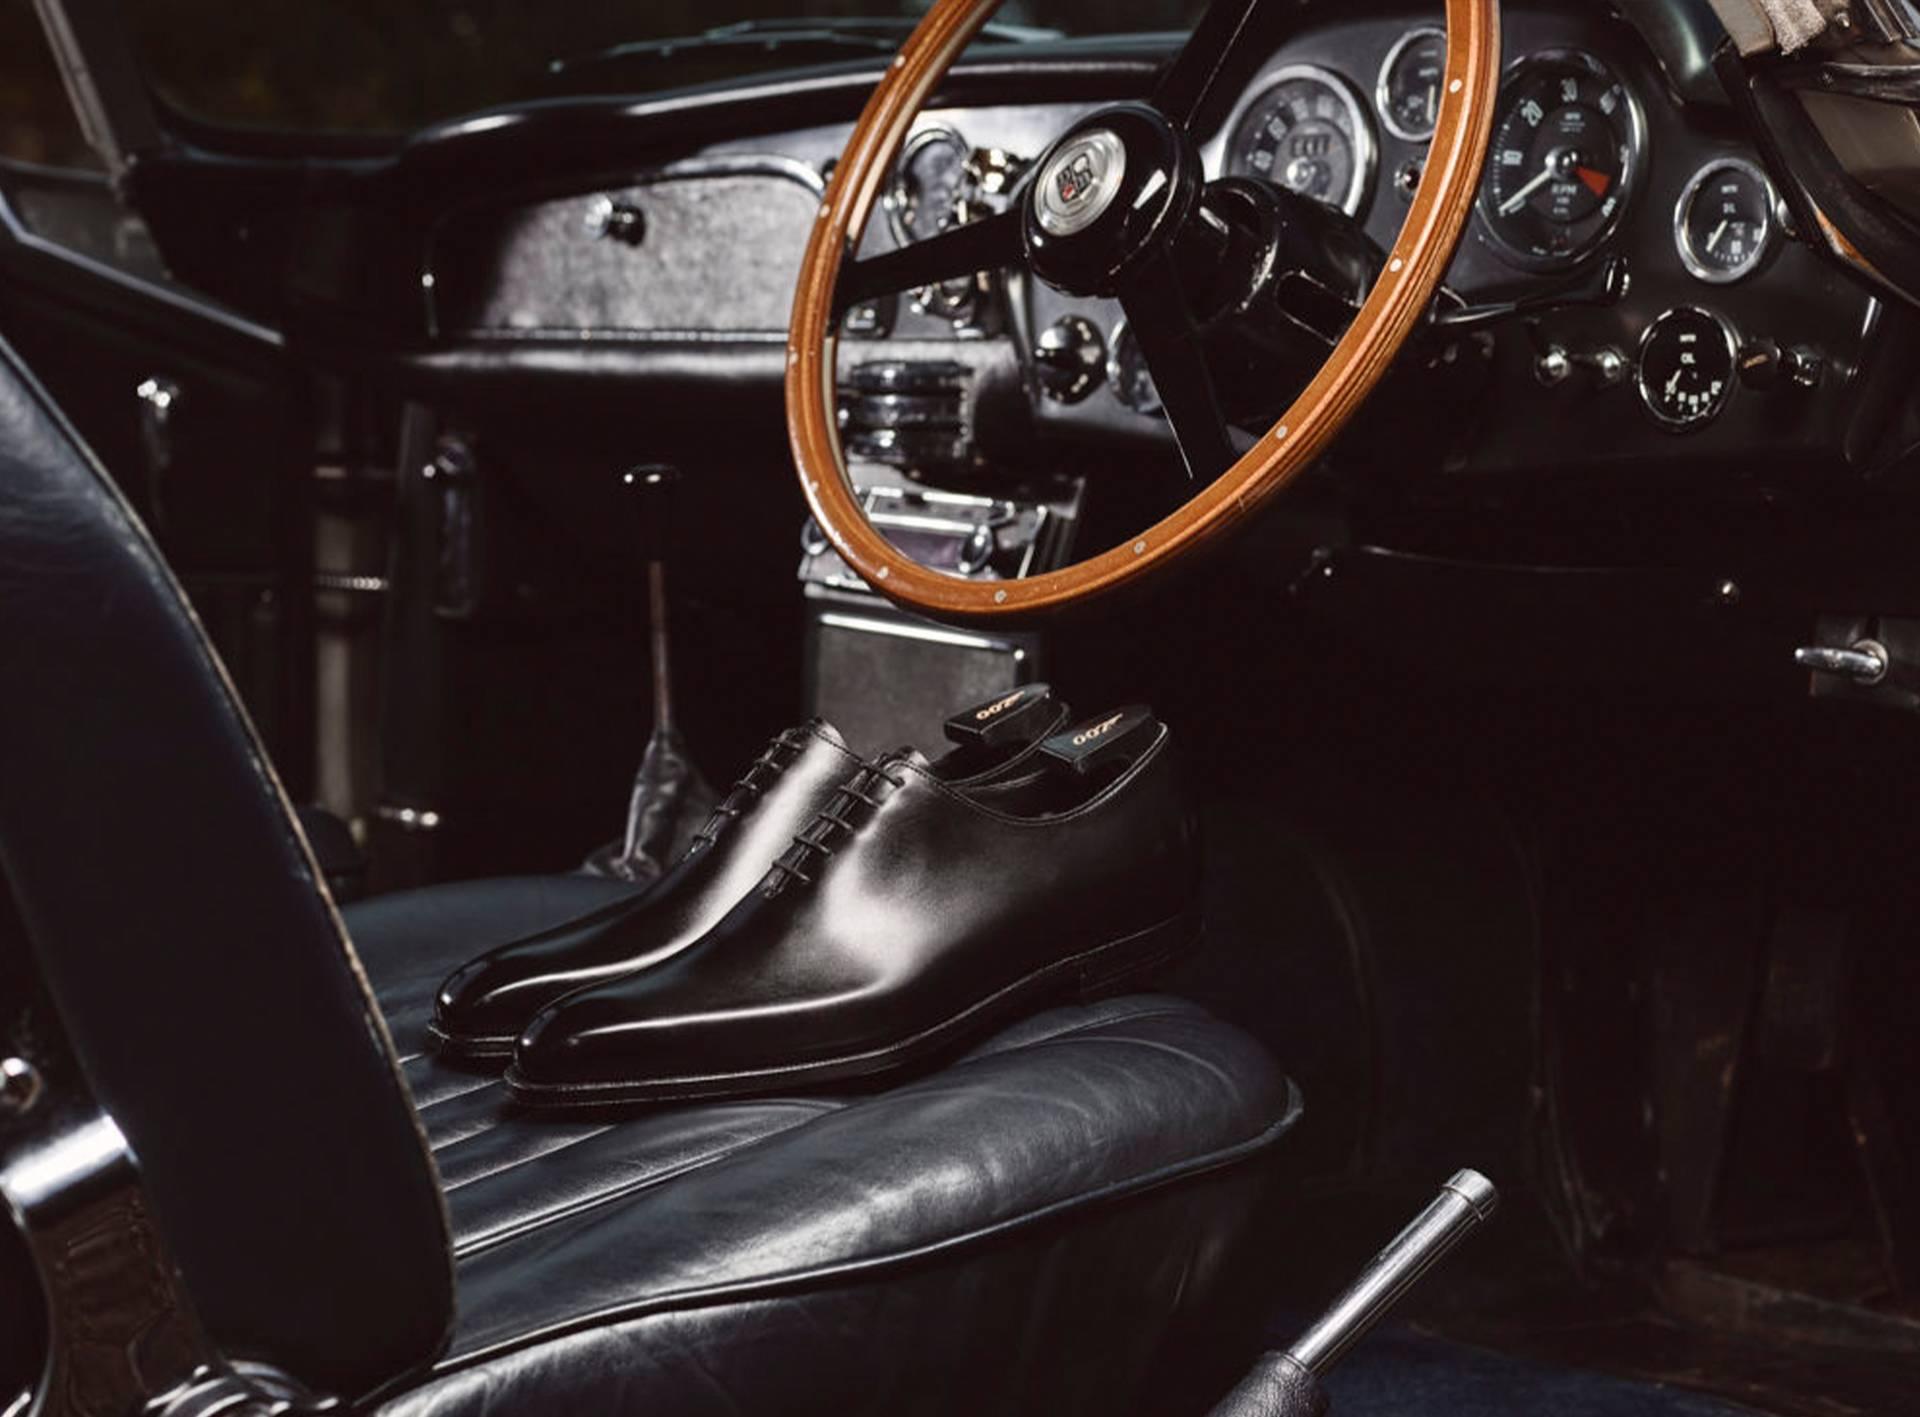 Crockett & Jones Limited Edition 007 Shoe